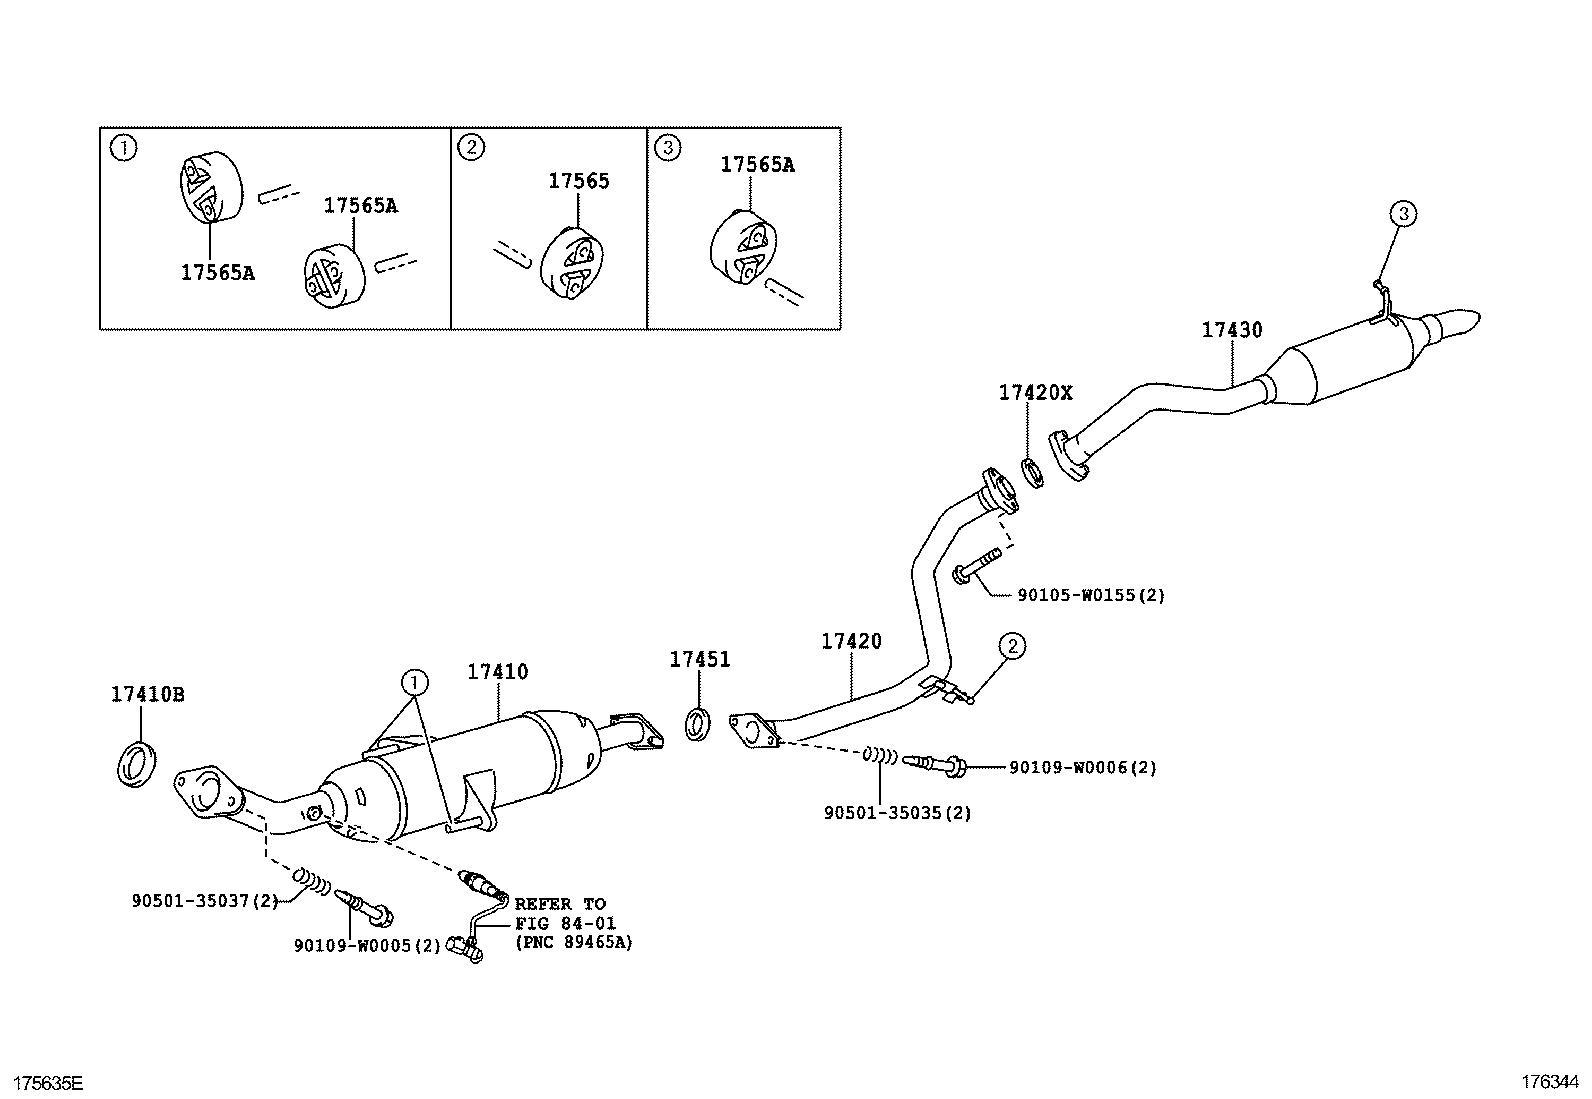 1992 Toyota corolla exhaust system